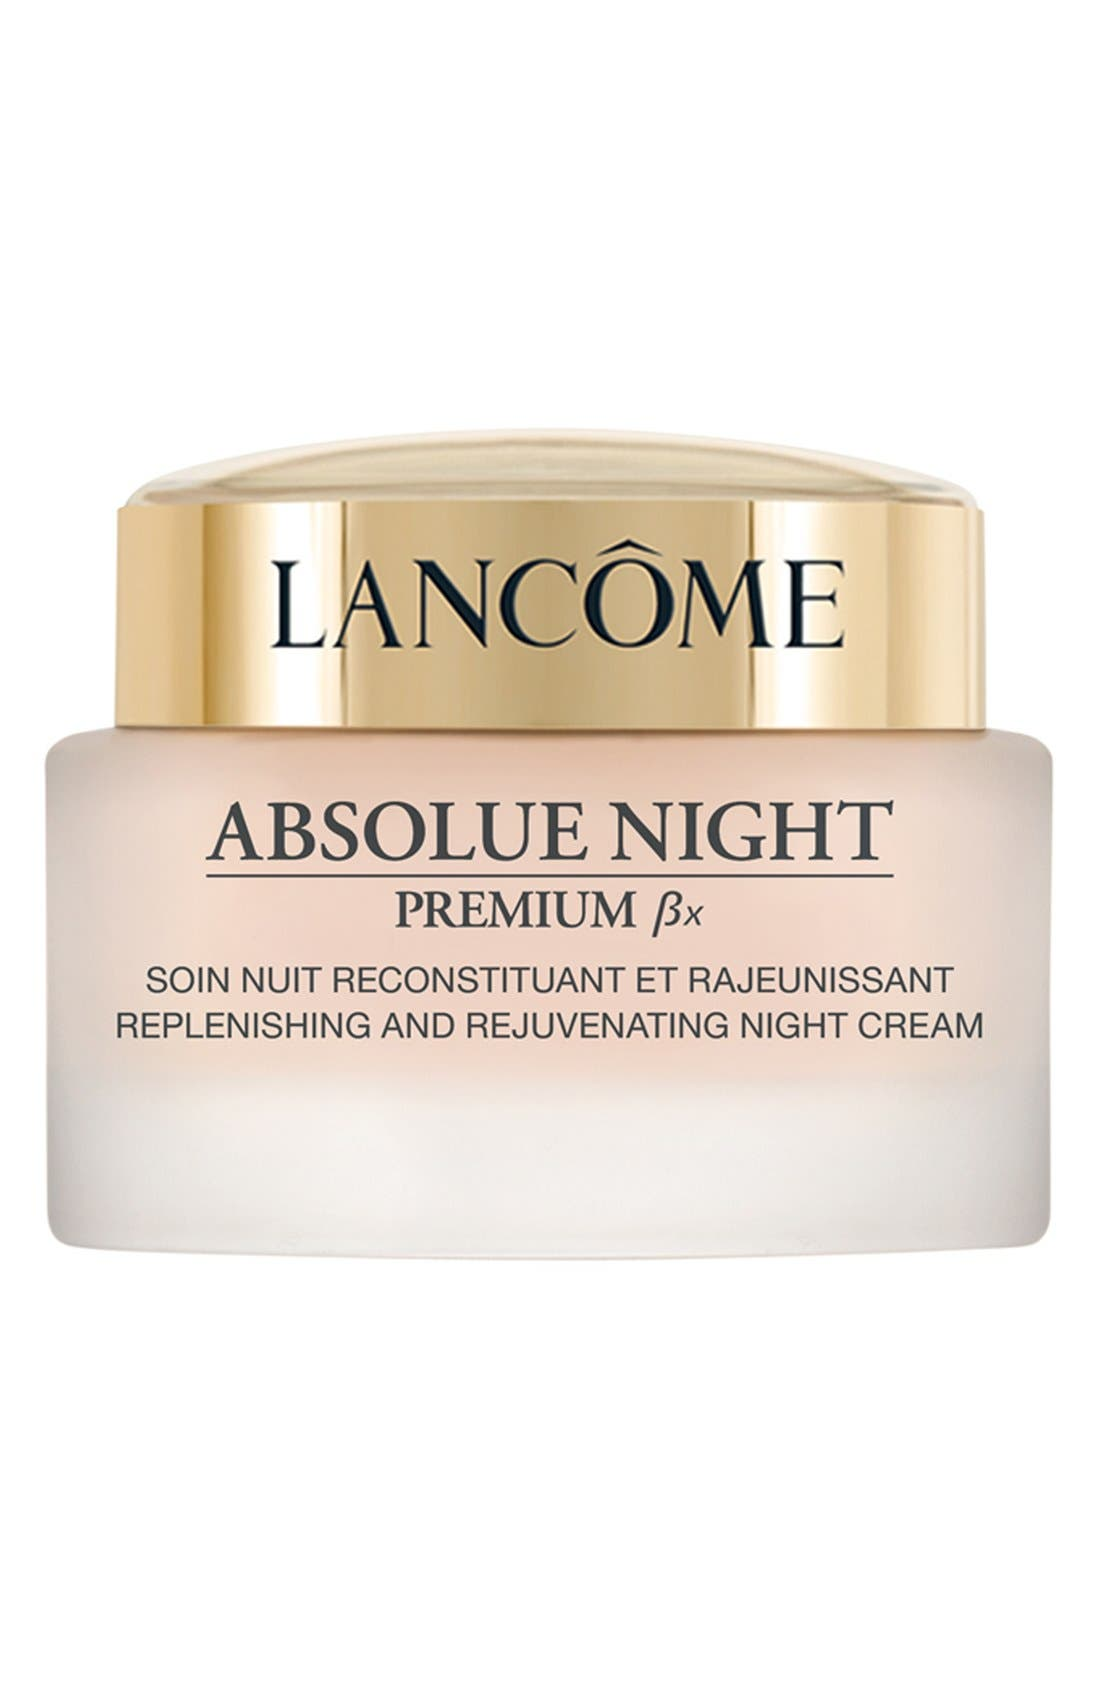 Lancôme Absolue Premium Bx Night Recovery Moisturizer Cream